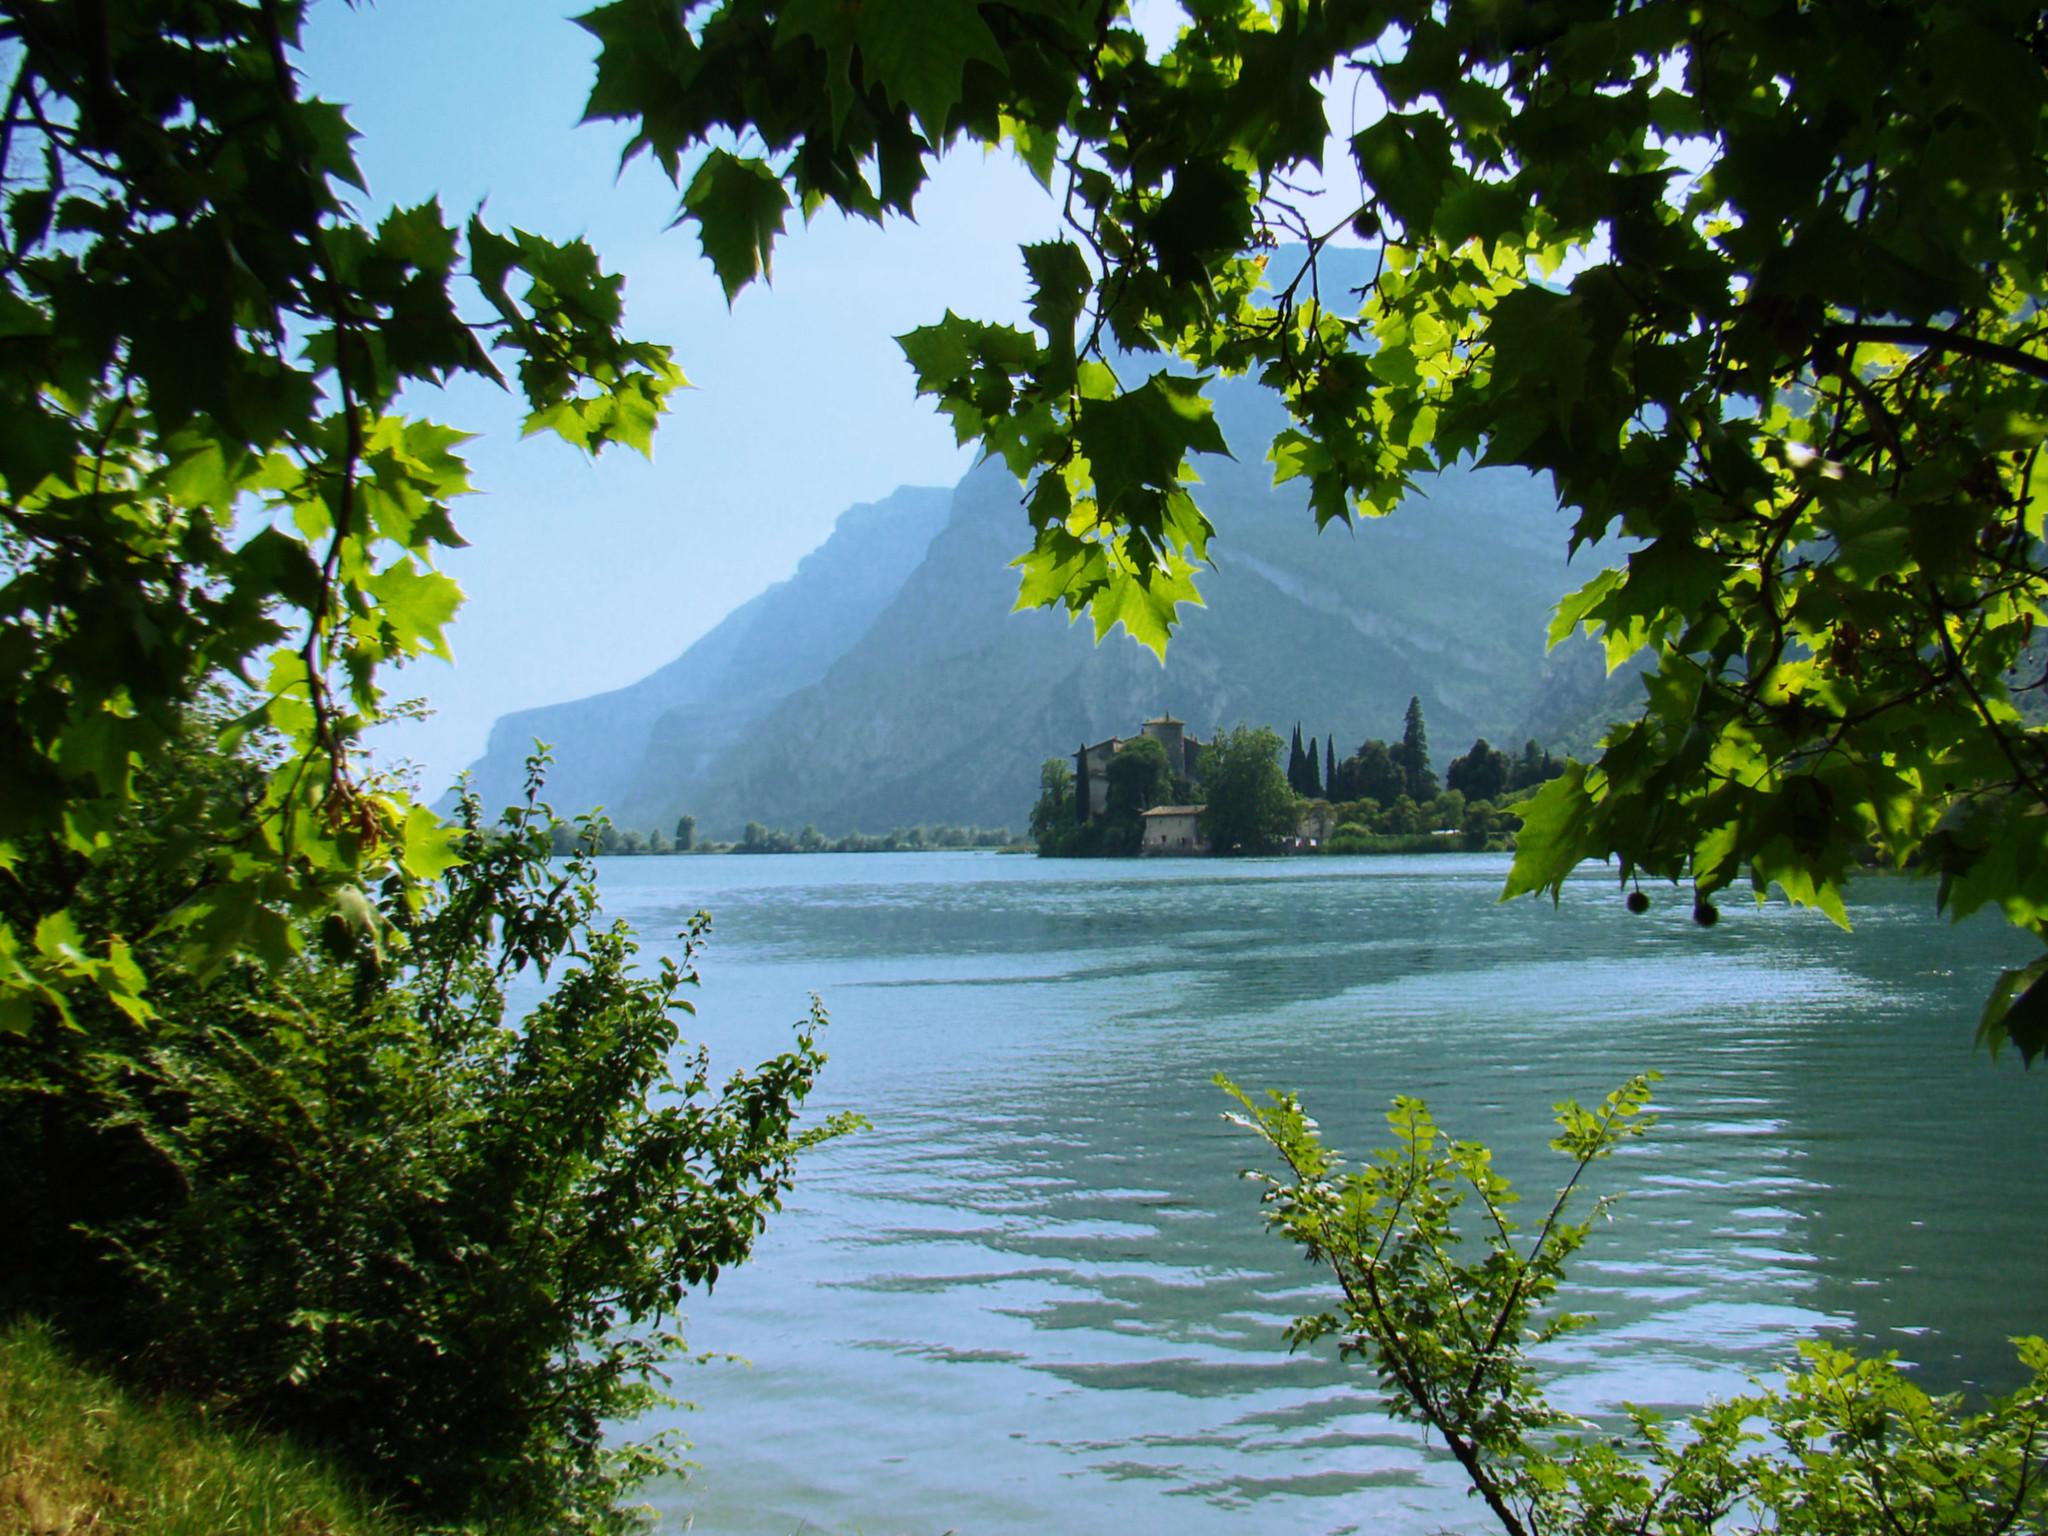 Lago Toblino vista del Castillo Toblino provincia de Trento Italia